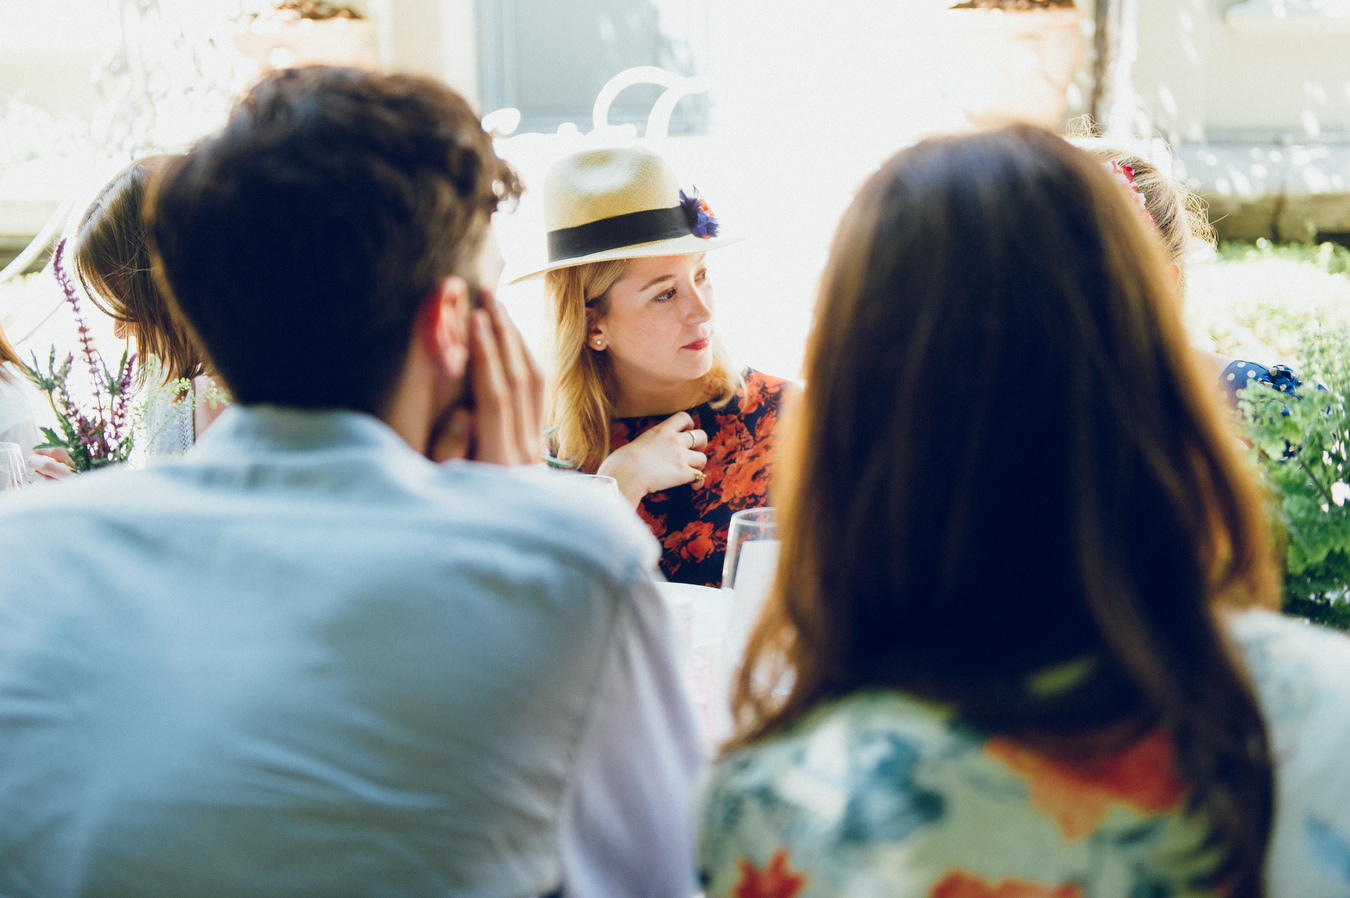 calista-one-lista-de-bodas-online-blog-de-bodas-calista-one-summer-party-2016-invitados-7